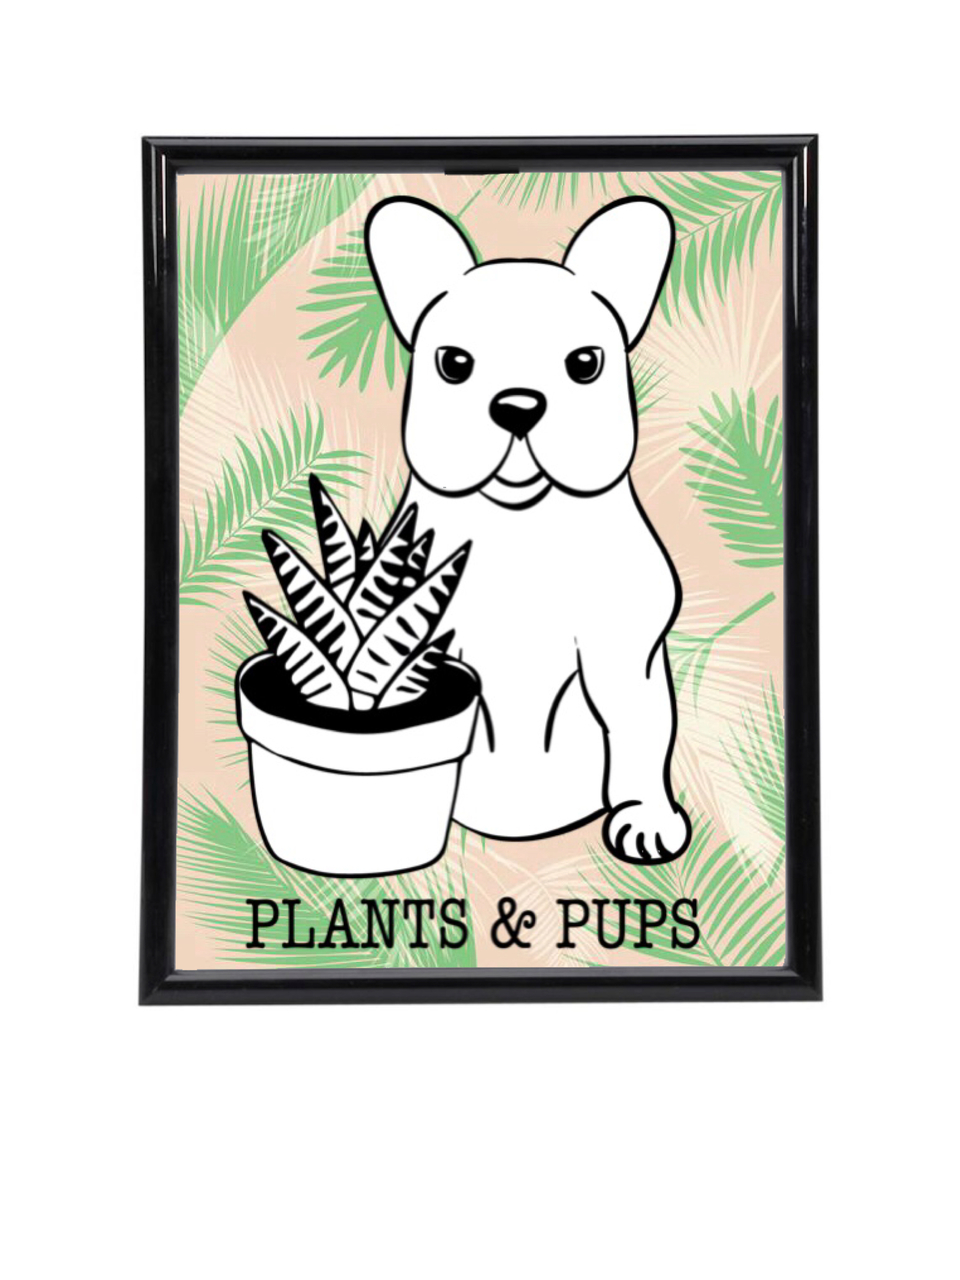 "PLANTS & PUPS Framed Poster (8.5"" x 11"")"